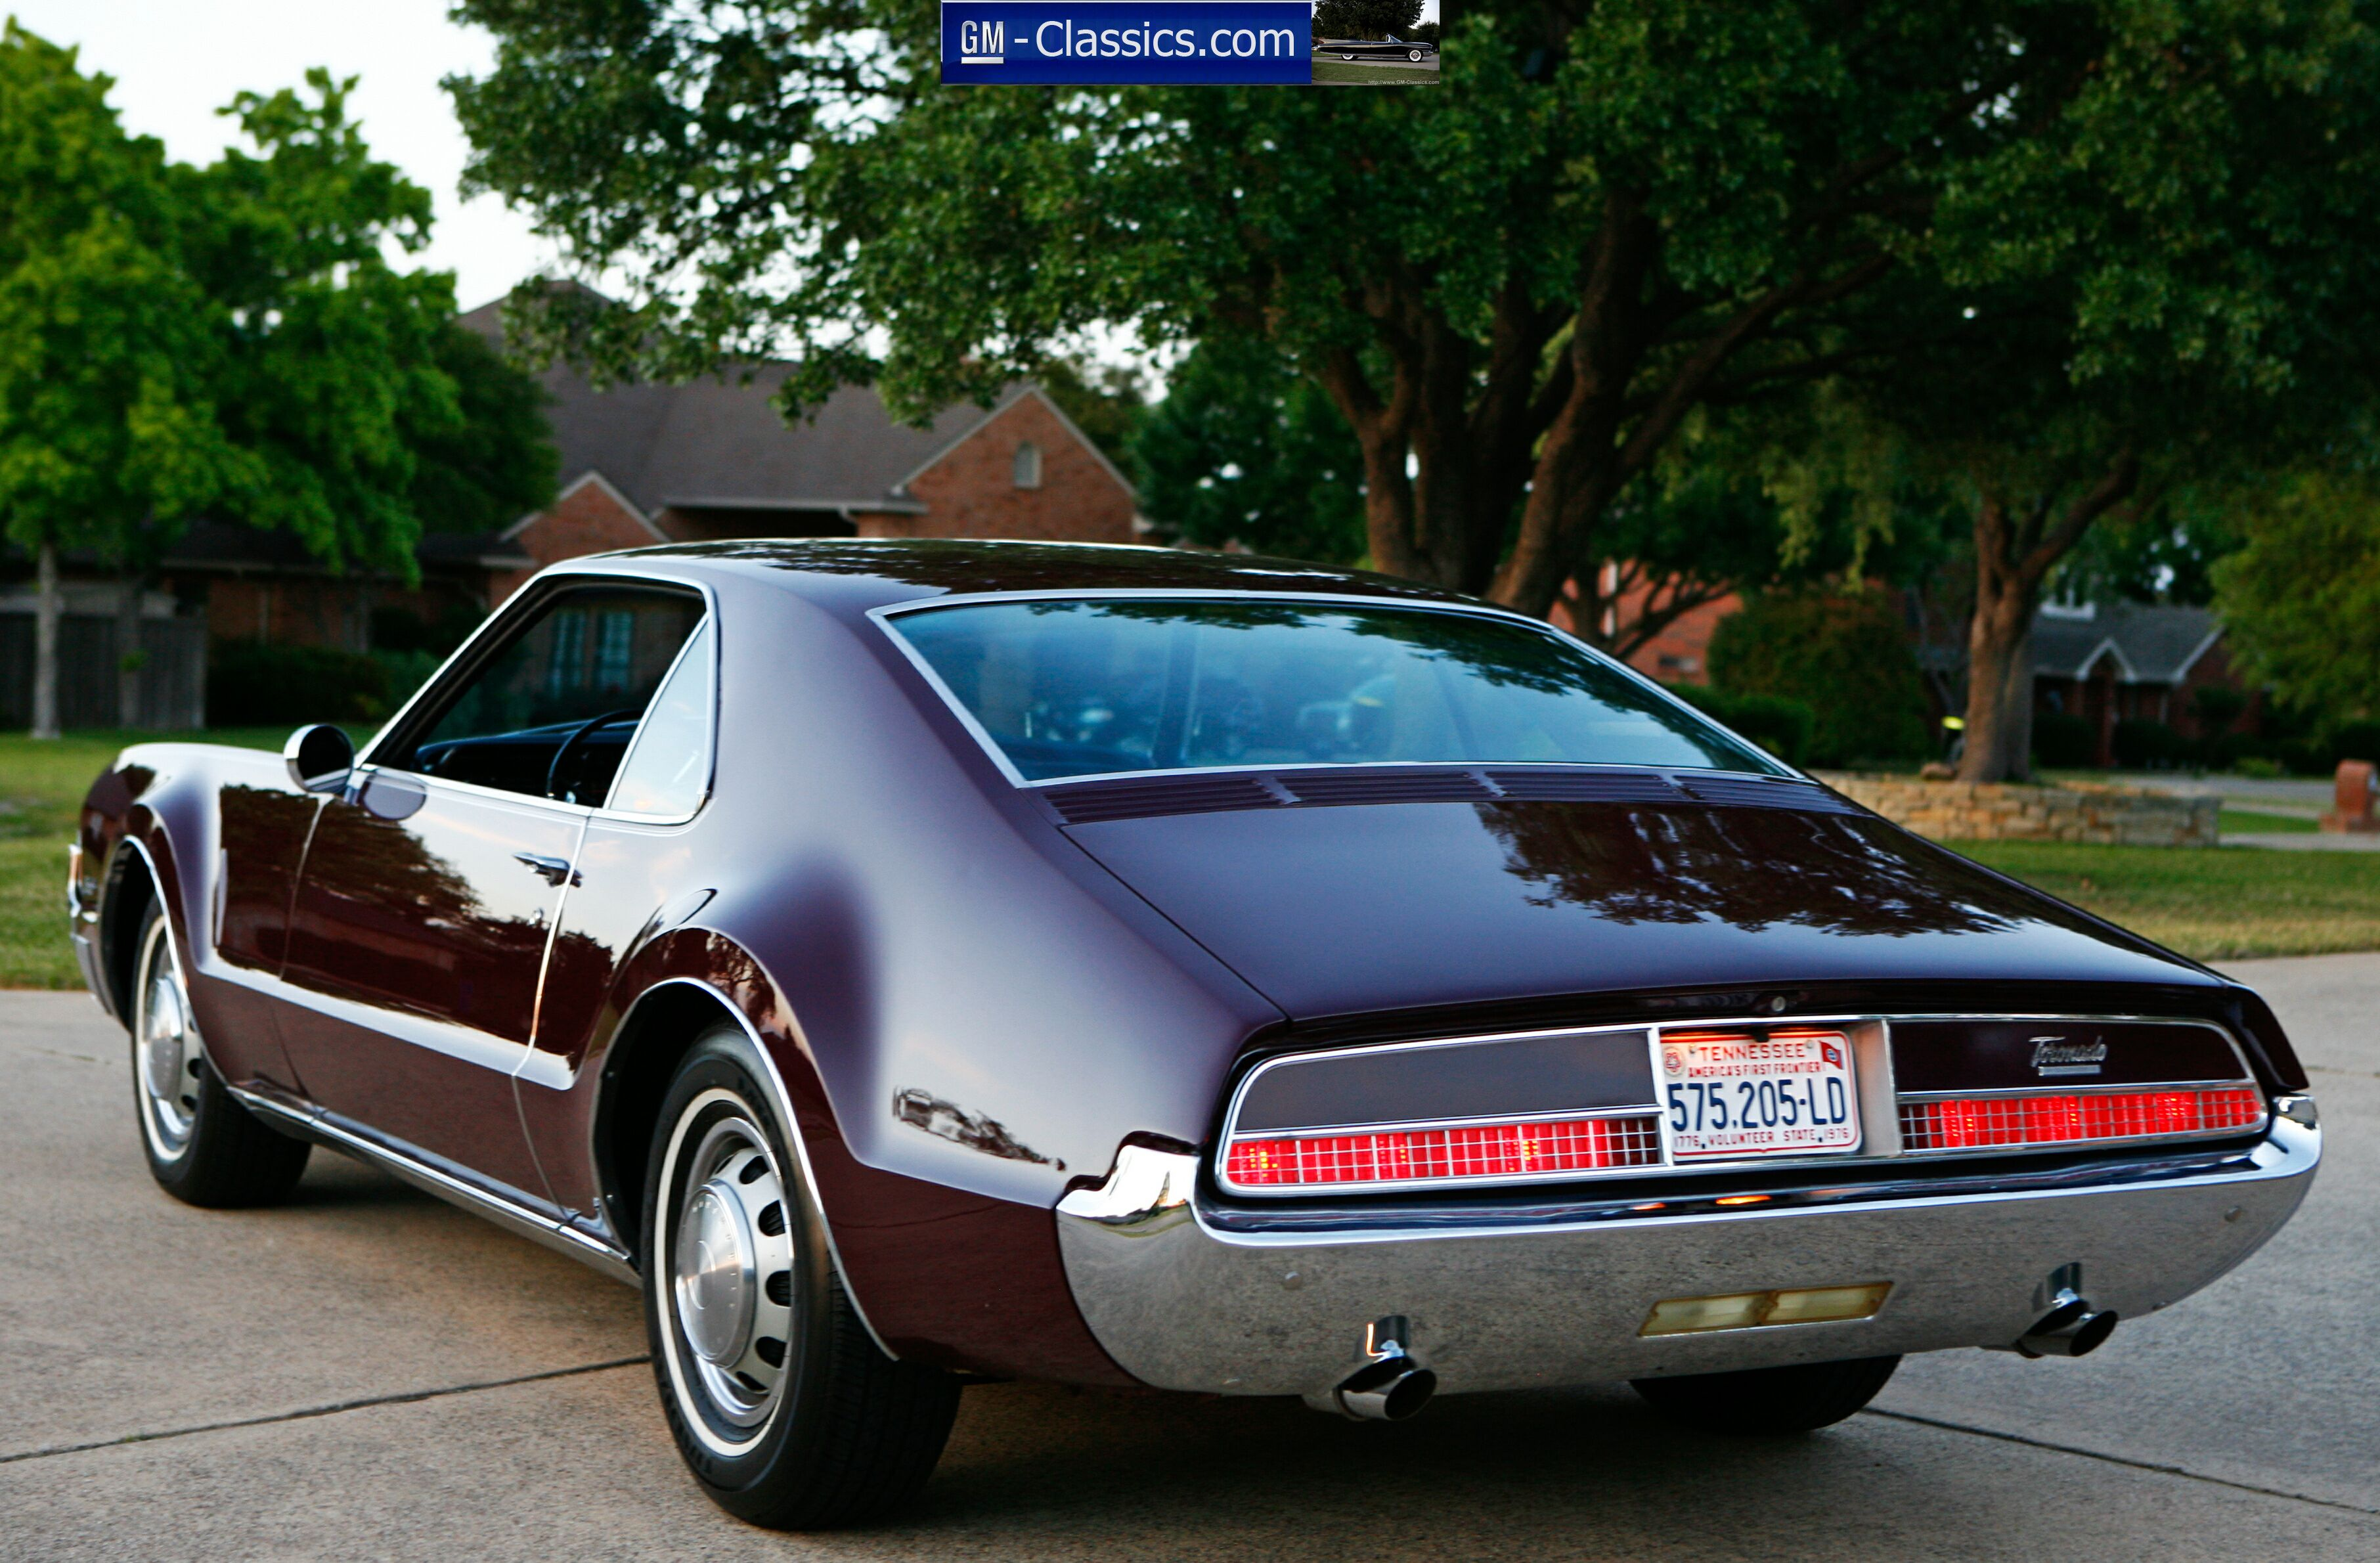 66ot2 furthermore Oldsmobile Toronado 1979 likewise 67 TORO also OL66 708 likewise 6151791824. on oldsmobile toronado